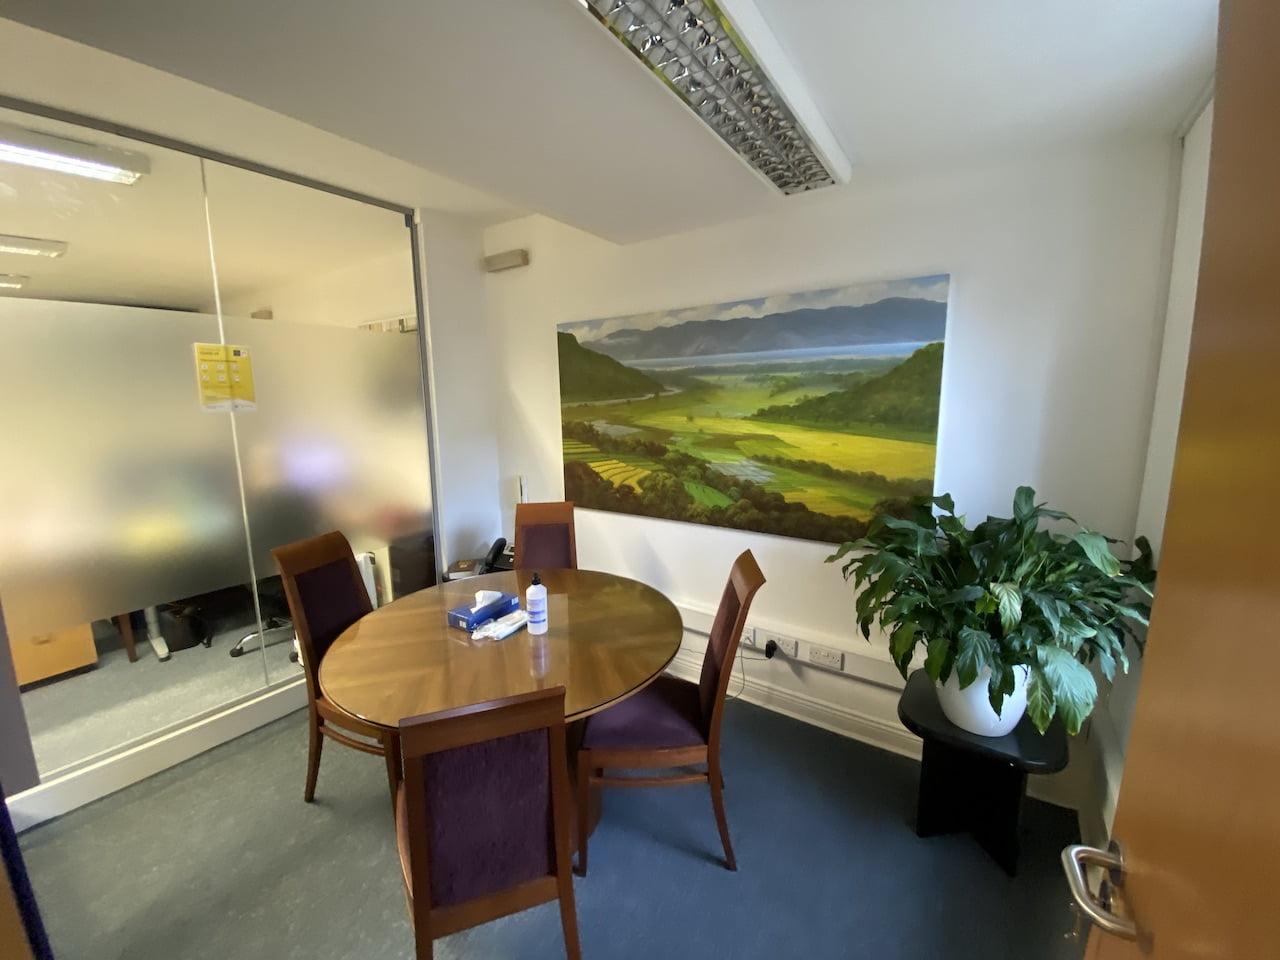 FOR SALE OFFICE At – 17 Priory Office Park, Stillorgan Rd, Blackrock, Co. Dublin